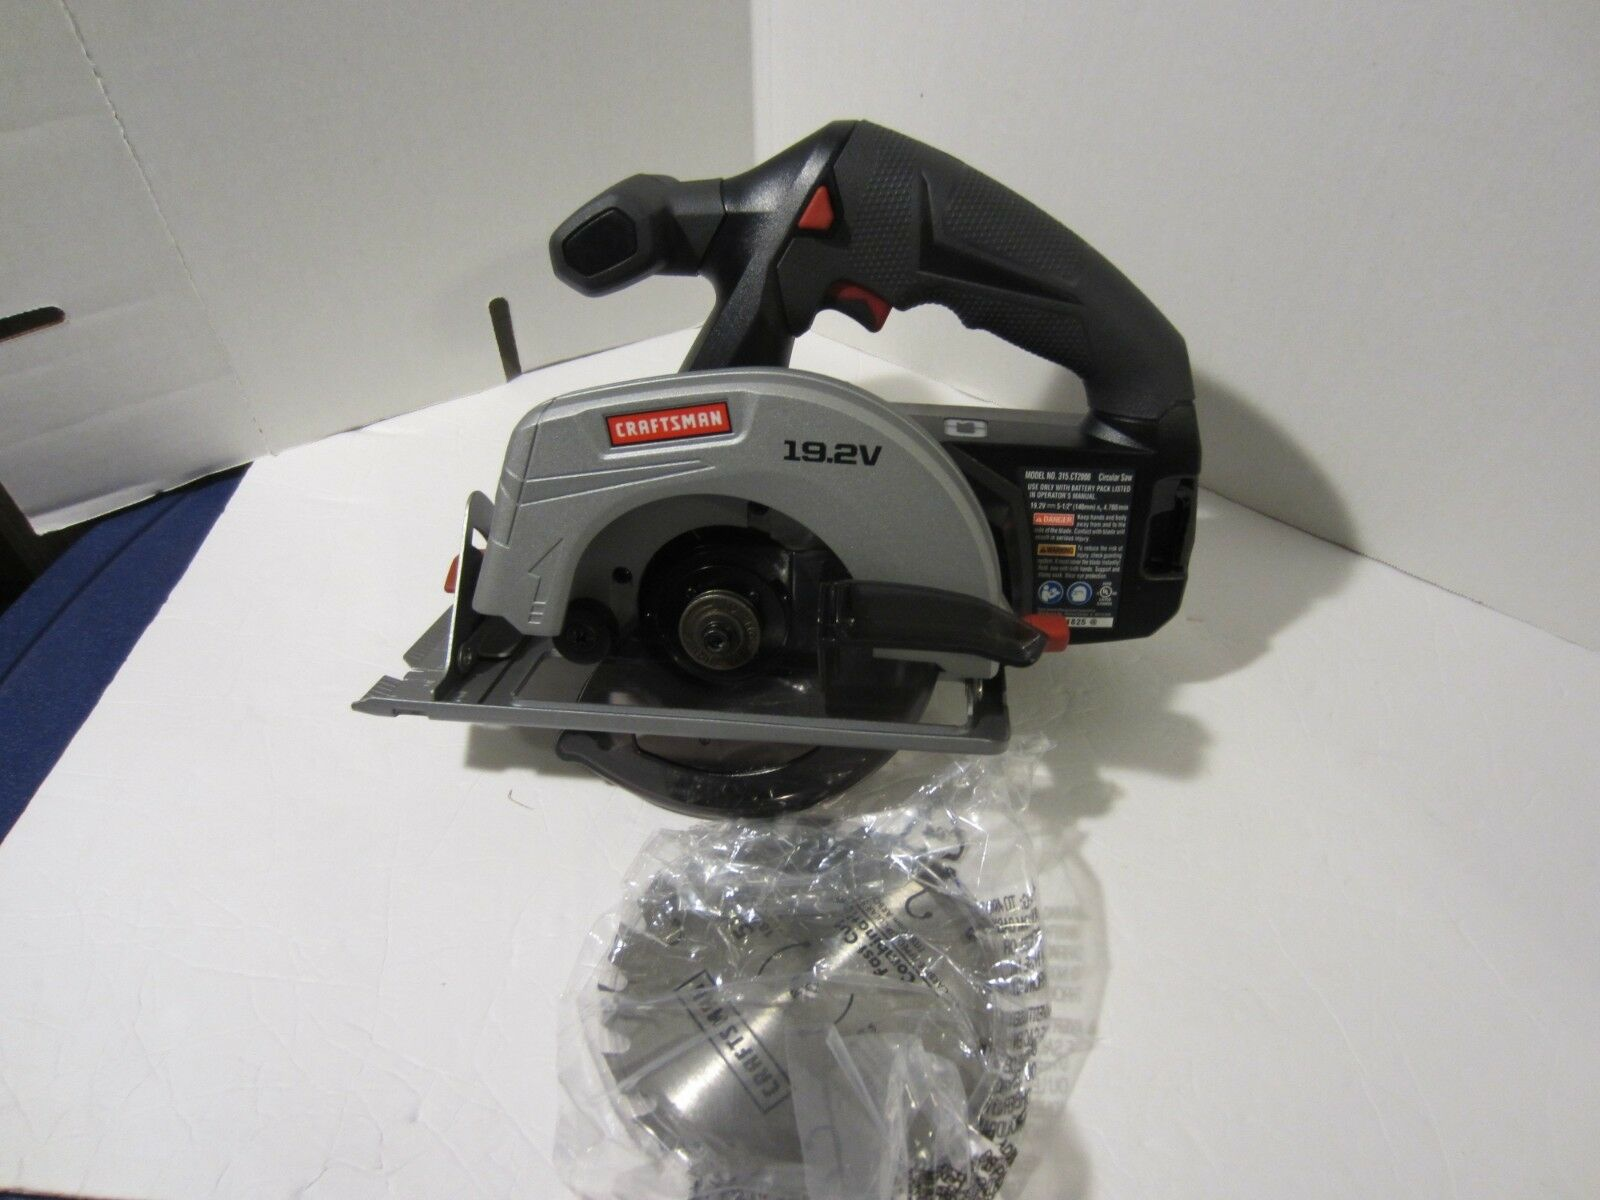 Craftsman C3 19.2 Volt 5 1/2 Inch Circular Saw Model CT2000 BARE TOOL